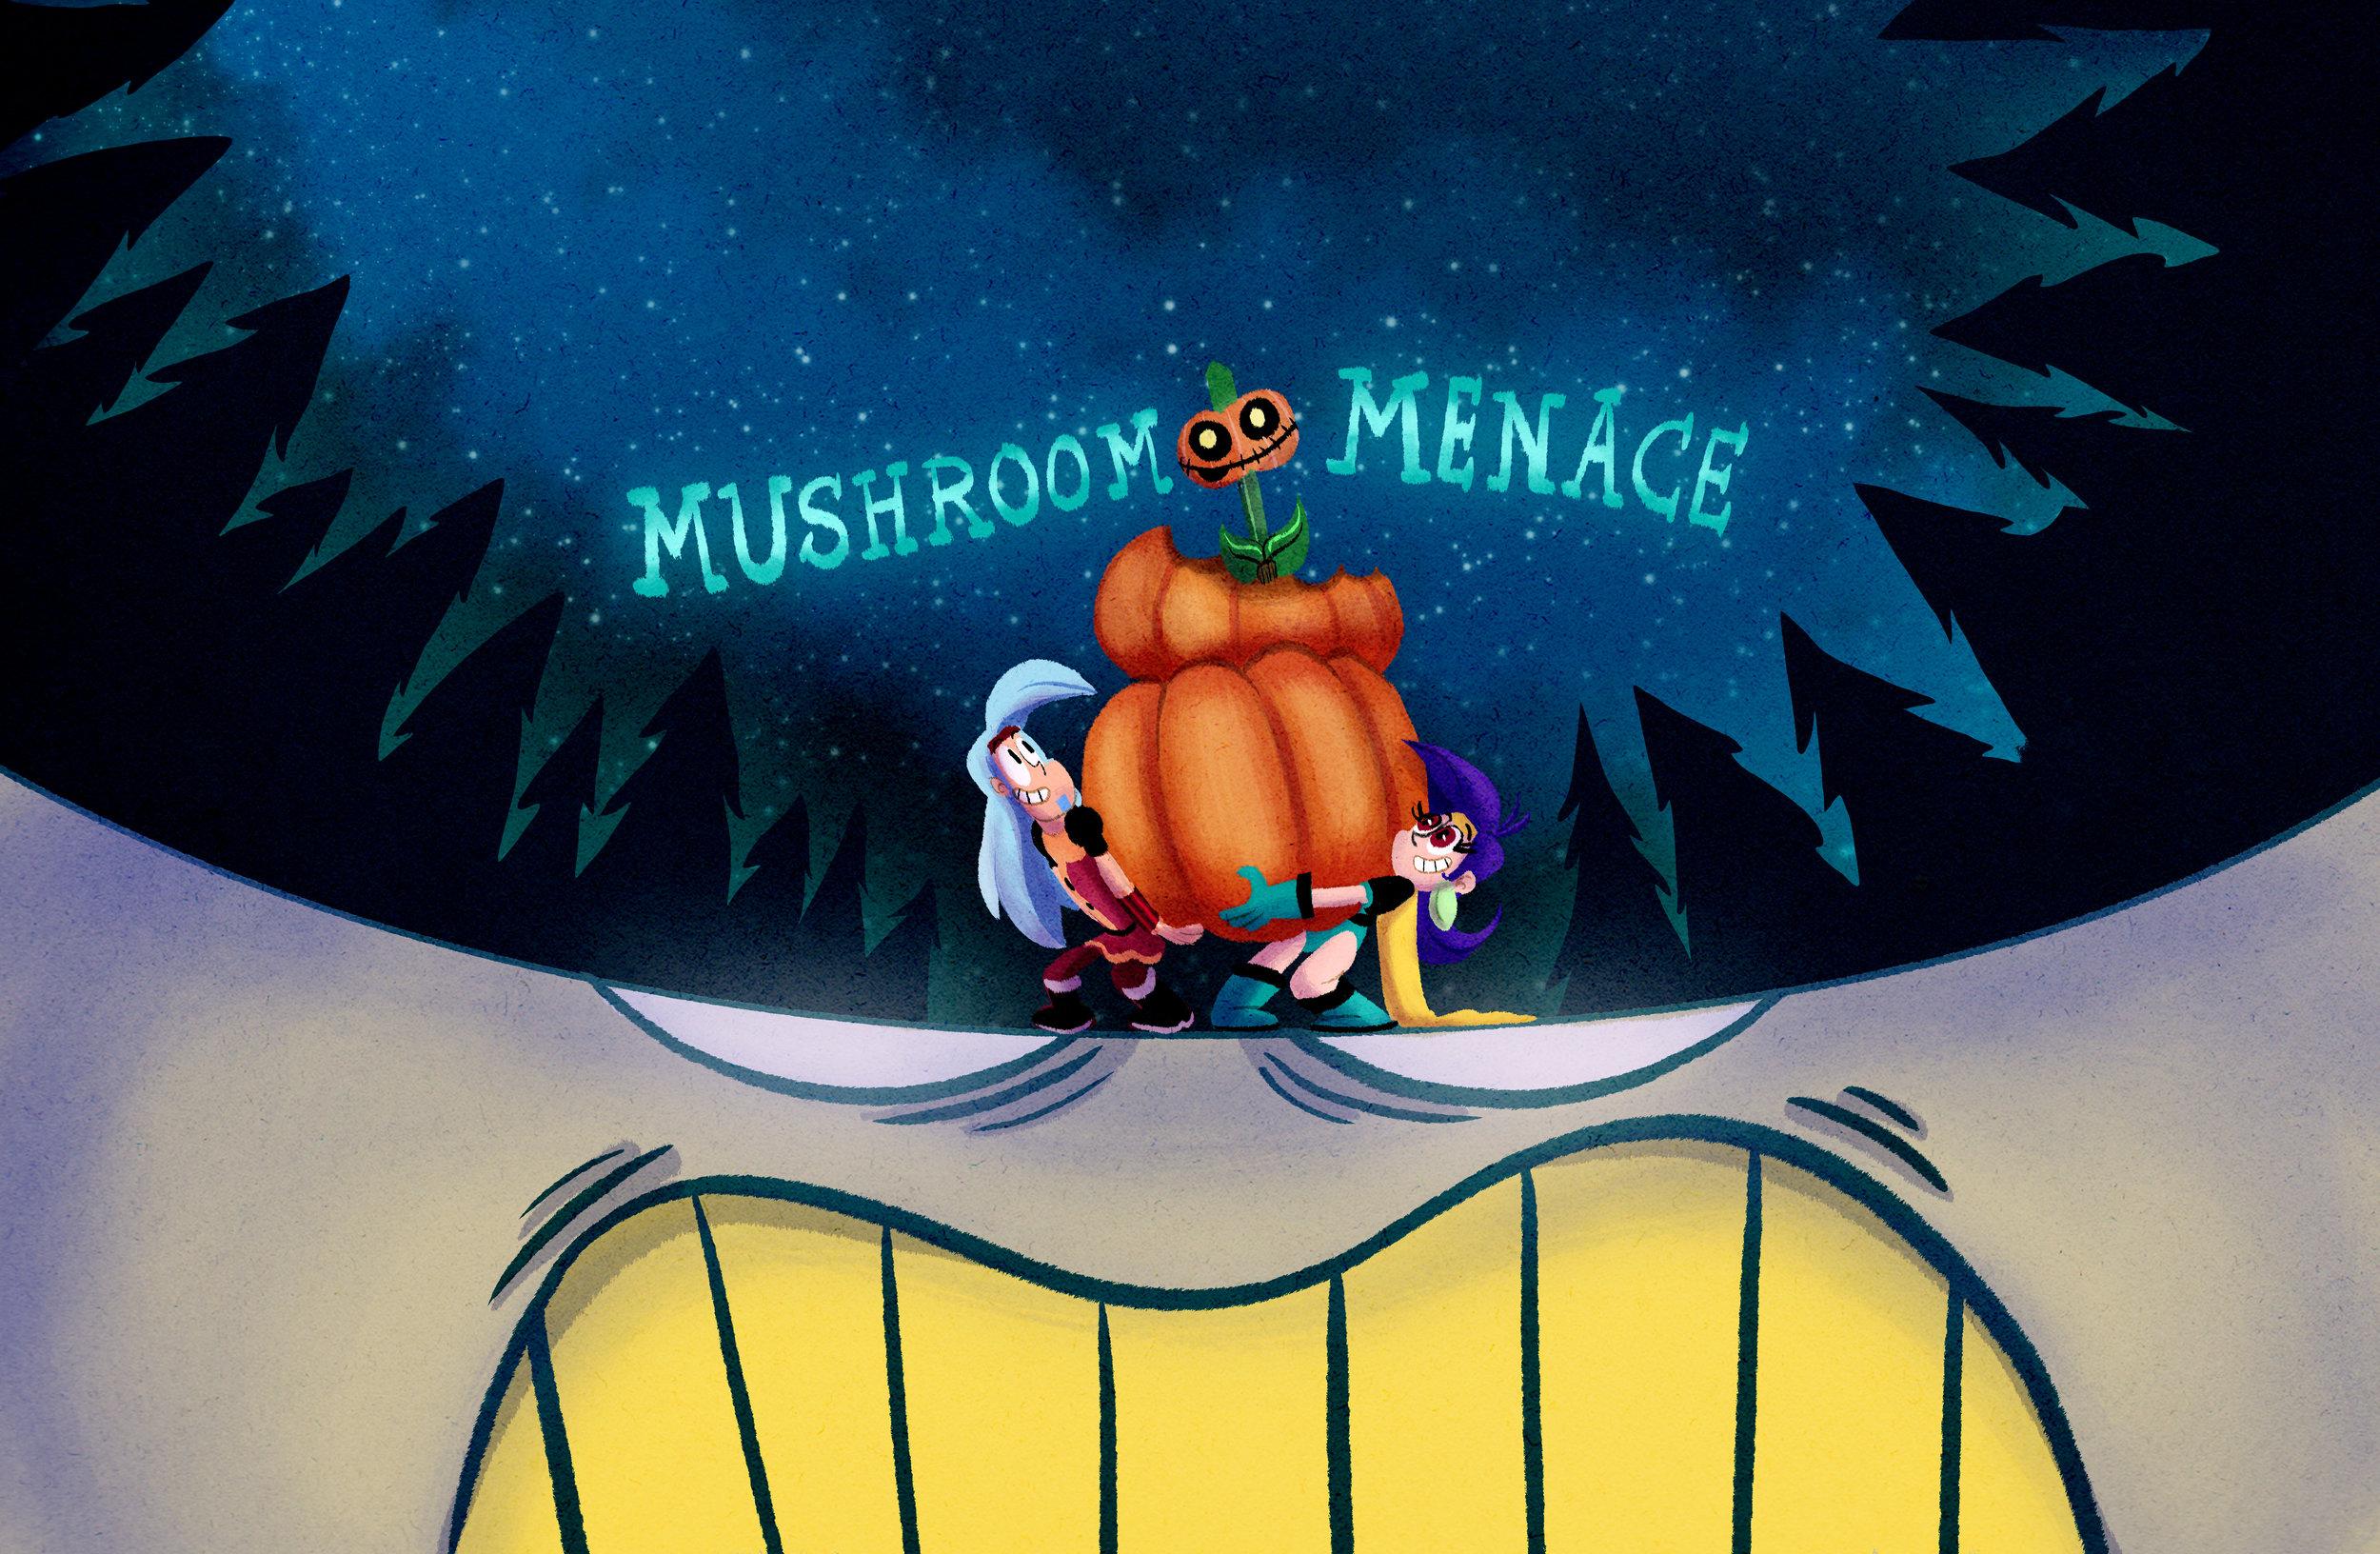 1046_607_MushroomMenace_01_c.jpg